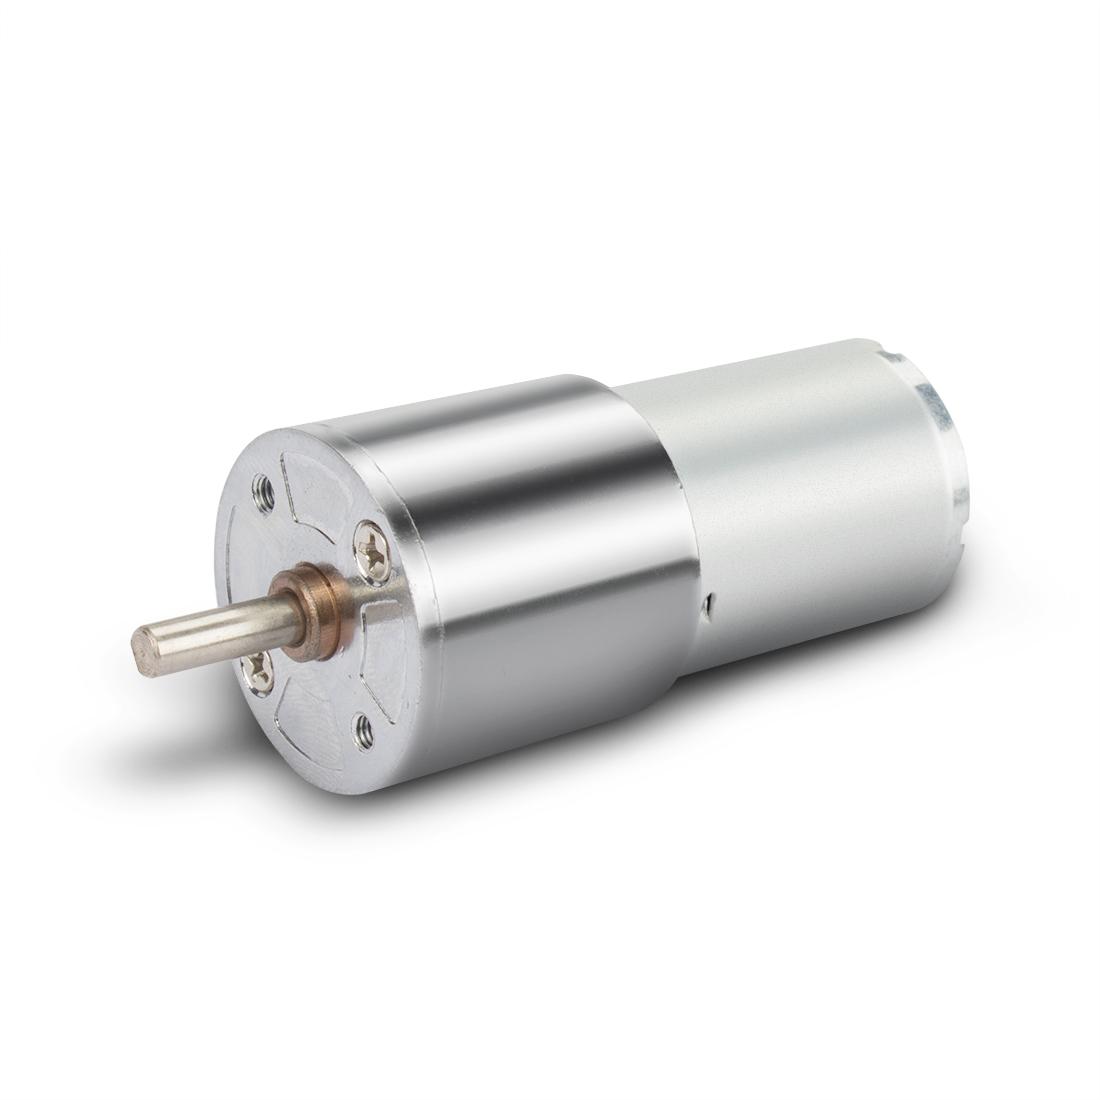 ZGA28RP DC 24V 5RPM Micro Gear Box Motor Speed Reduction Centric Output Shaft